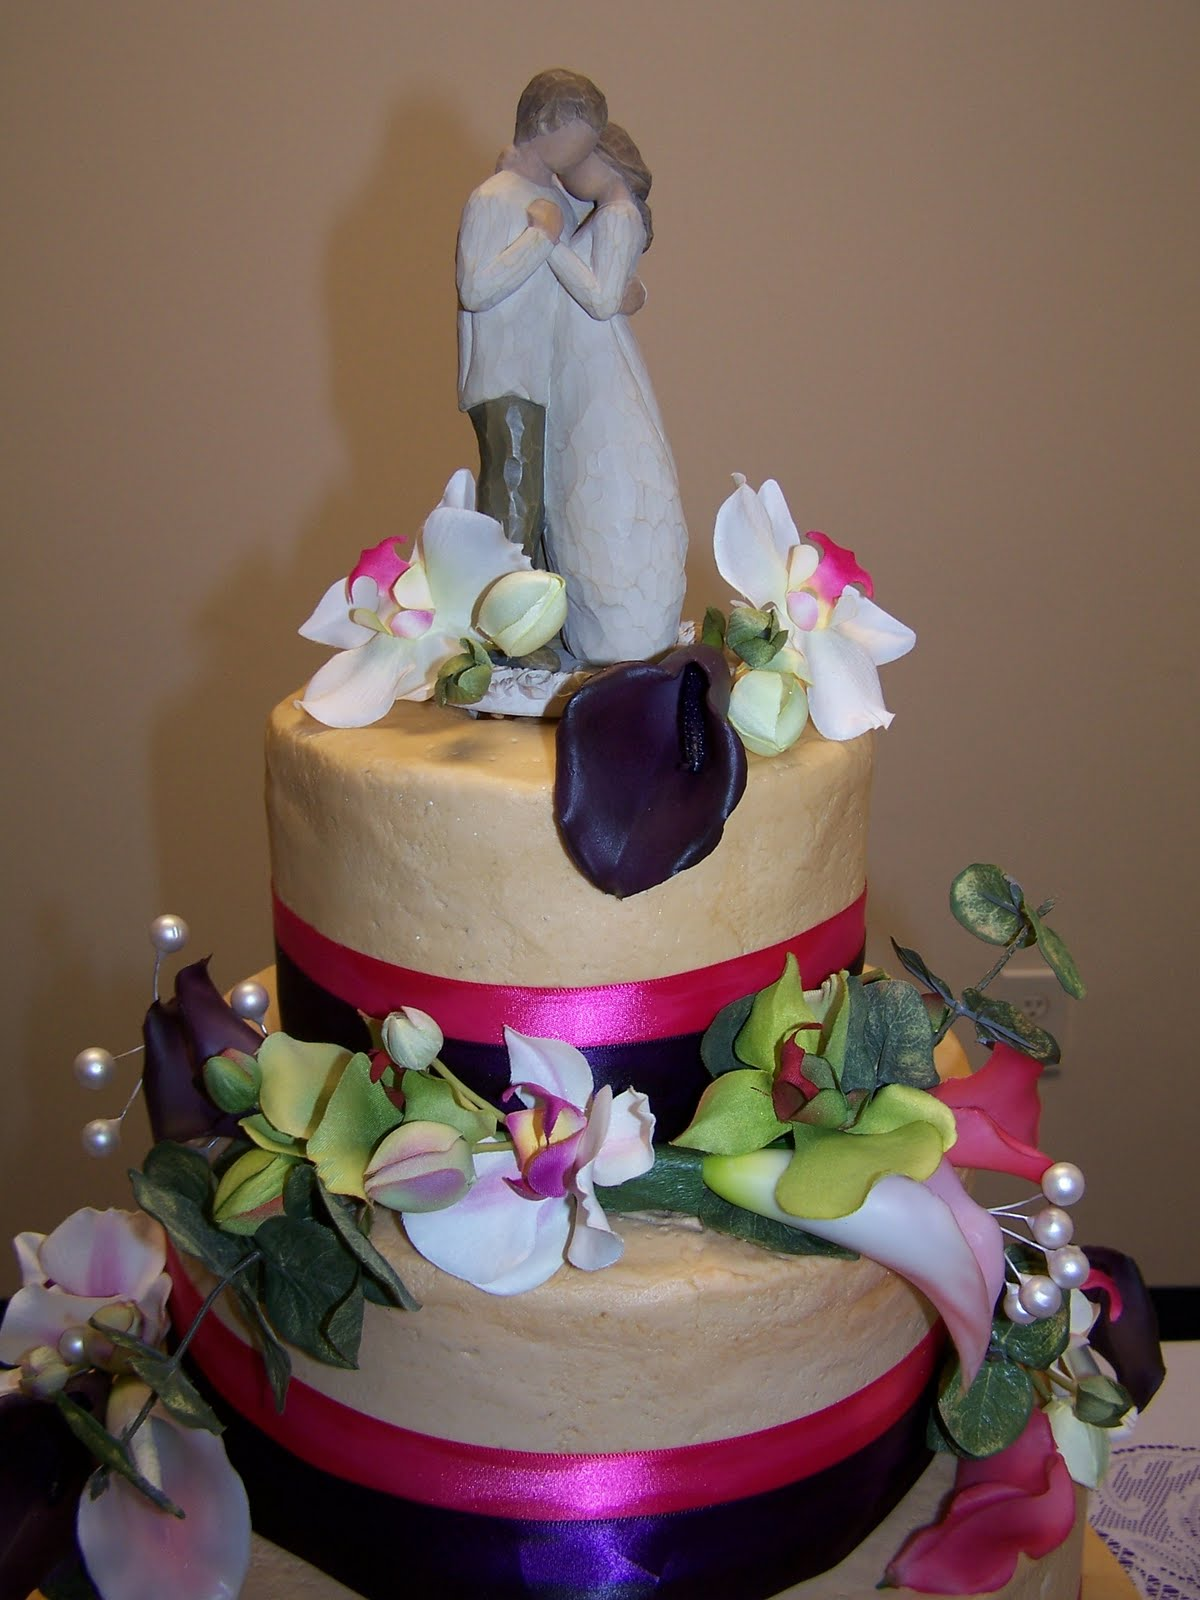 Creative Cakes N More Willow Tree Wedding Cake